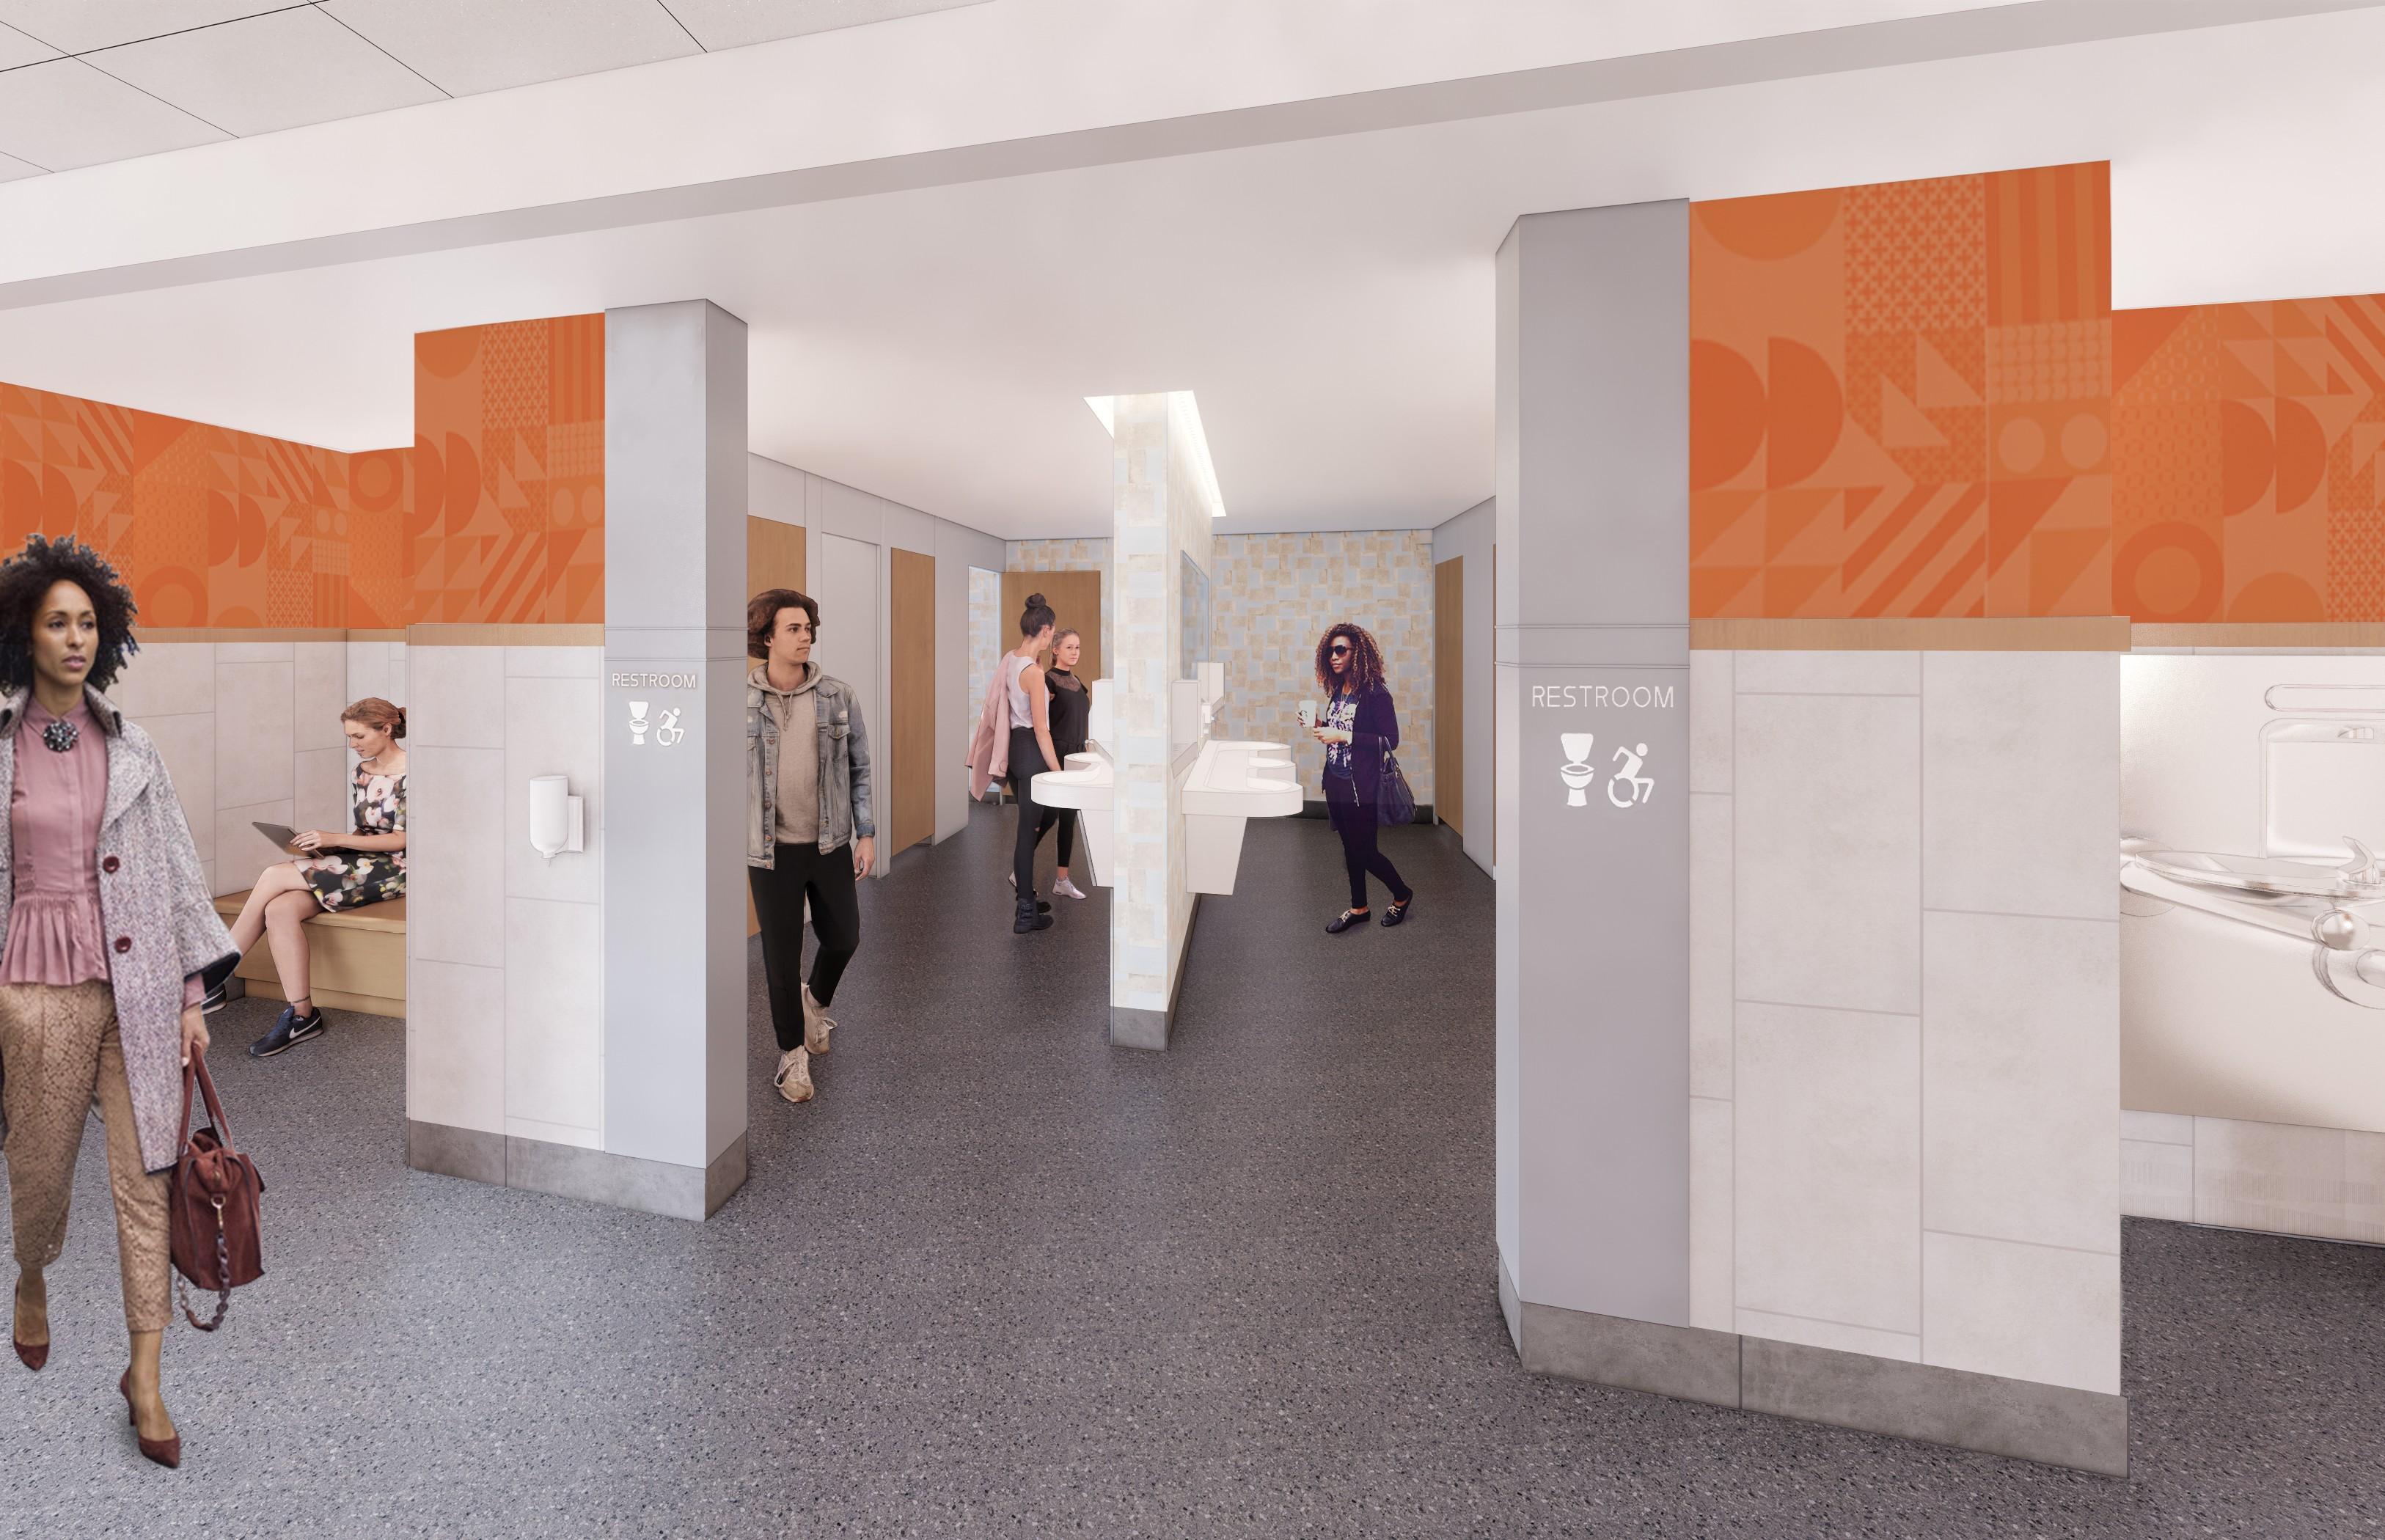 All-Gender toilet room study